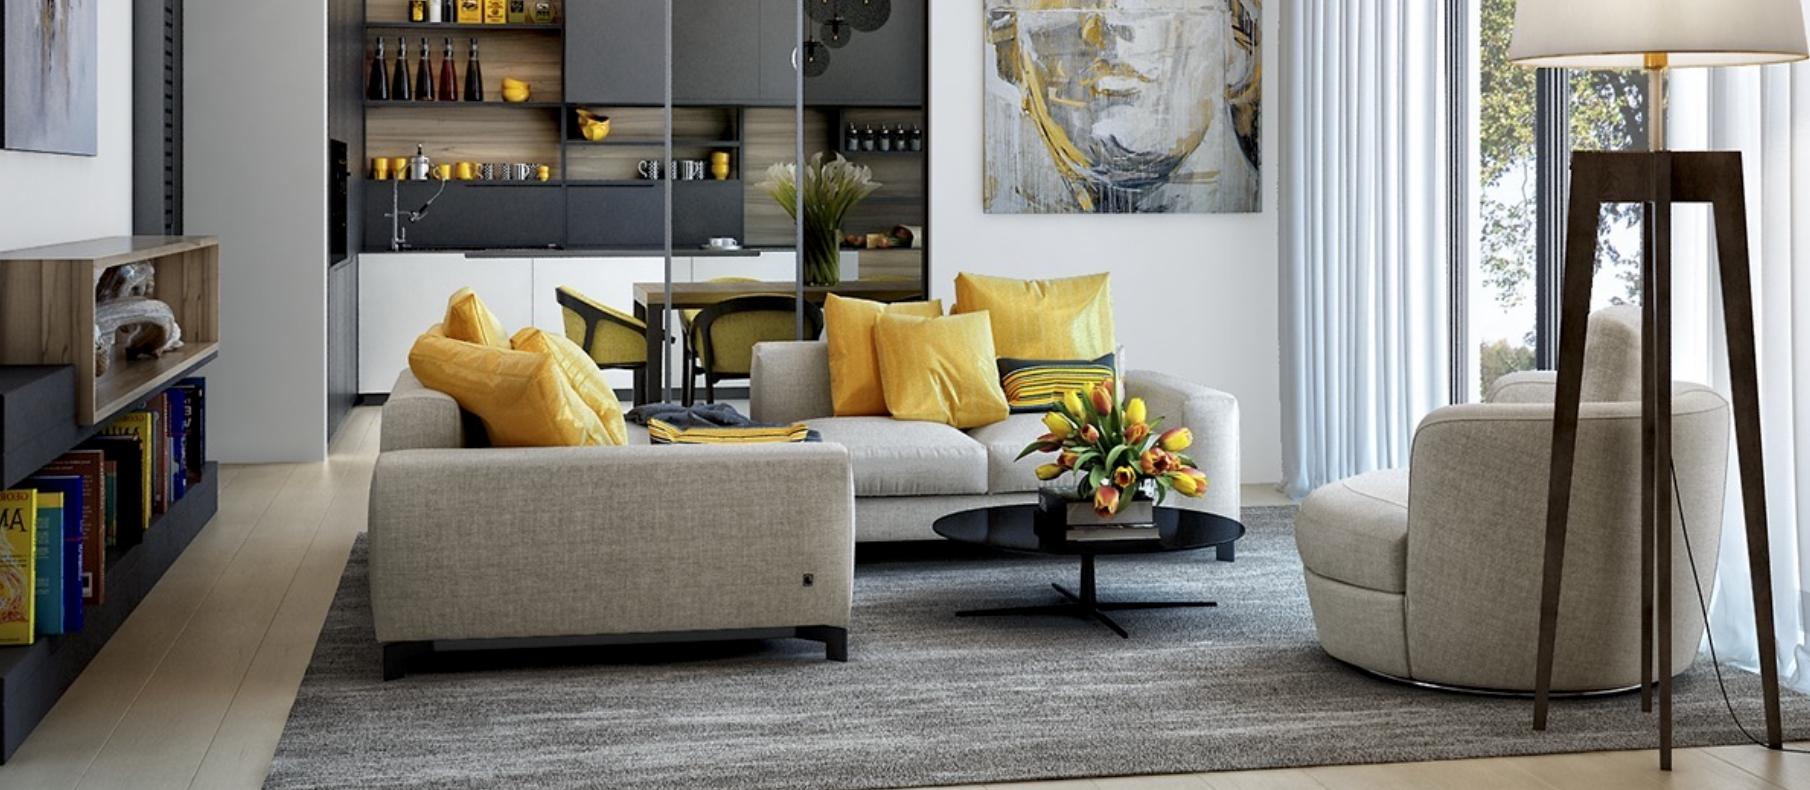 yellow-design-scheme-lounge-apartment